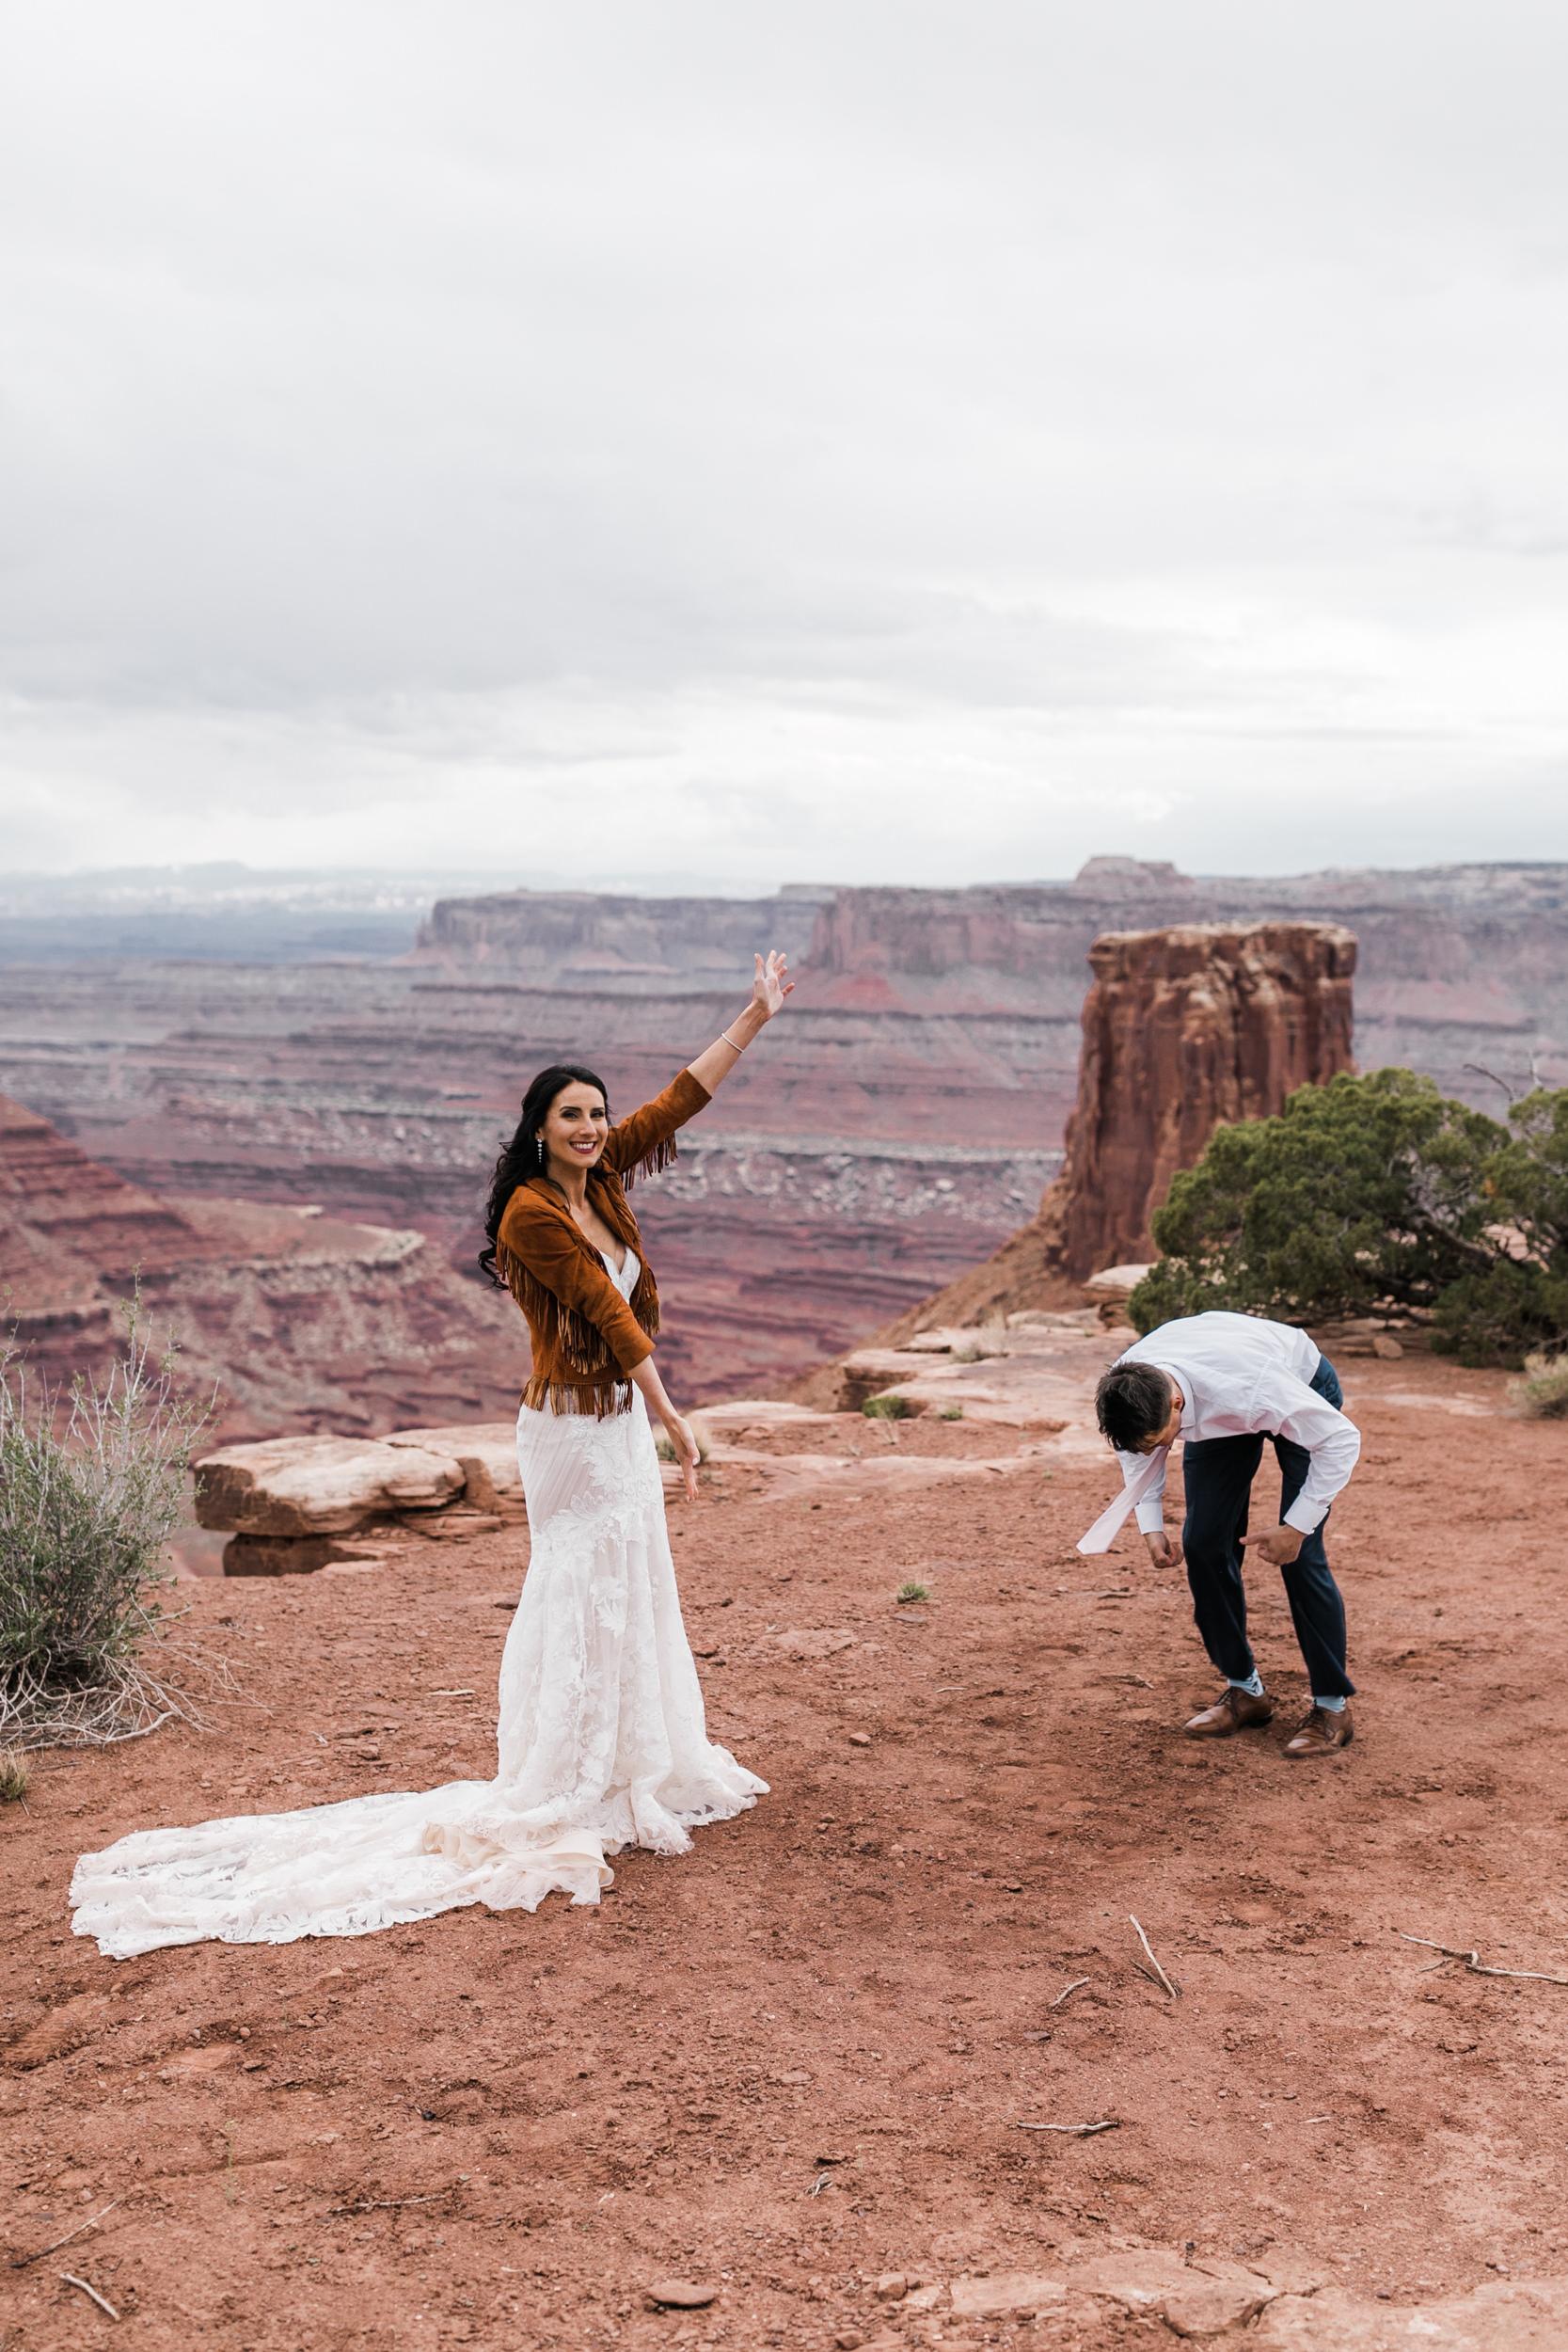 Jeep-Wedding-Moab-Utah-Hearnes-Adventure-Elopement-Photography-39.jpg